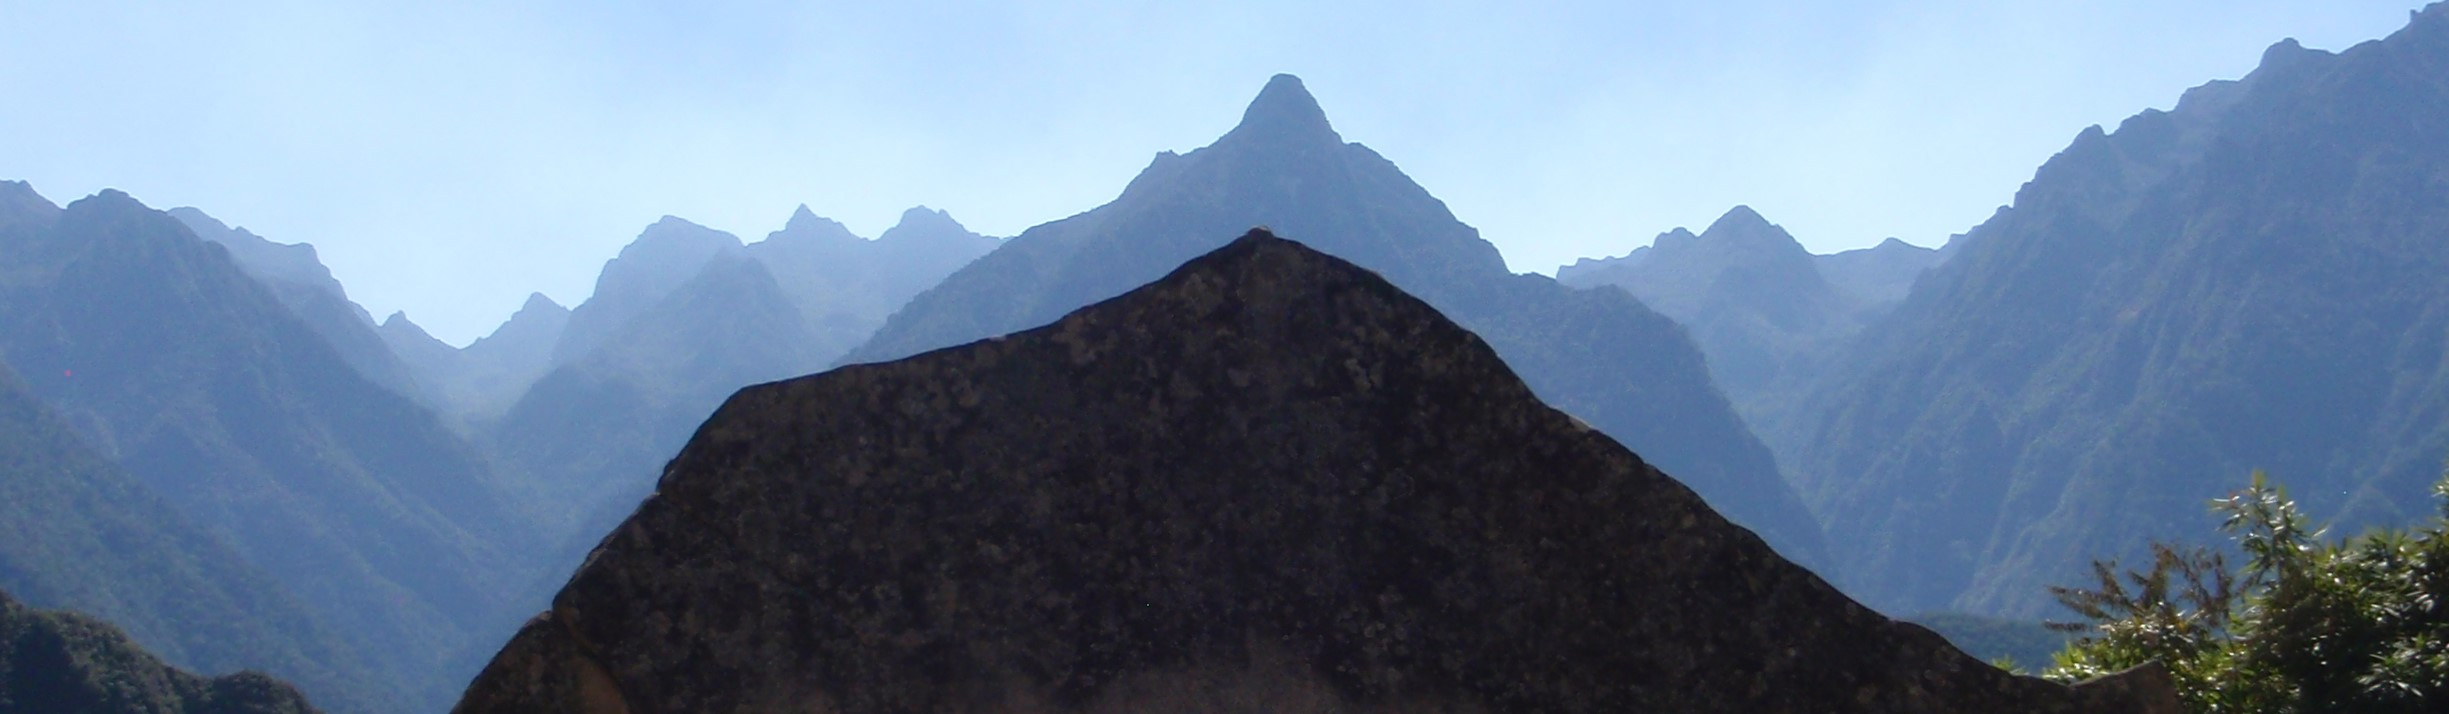 Mountain ridge silhouette at Machu, Picchu Peru, image search